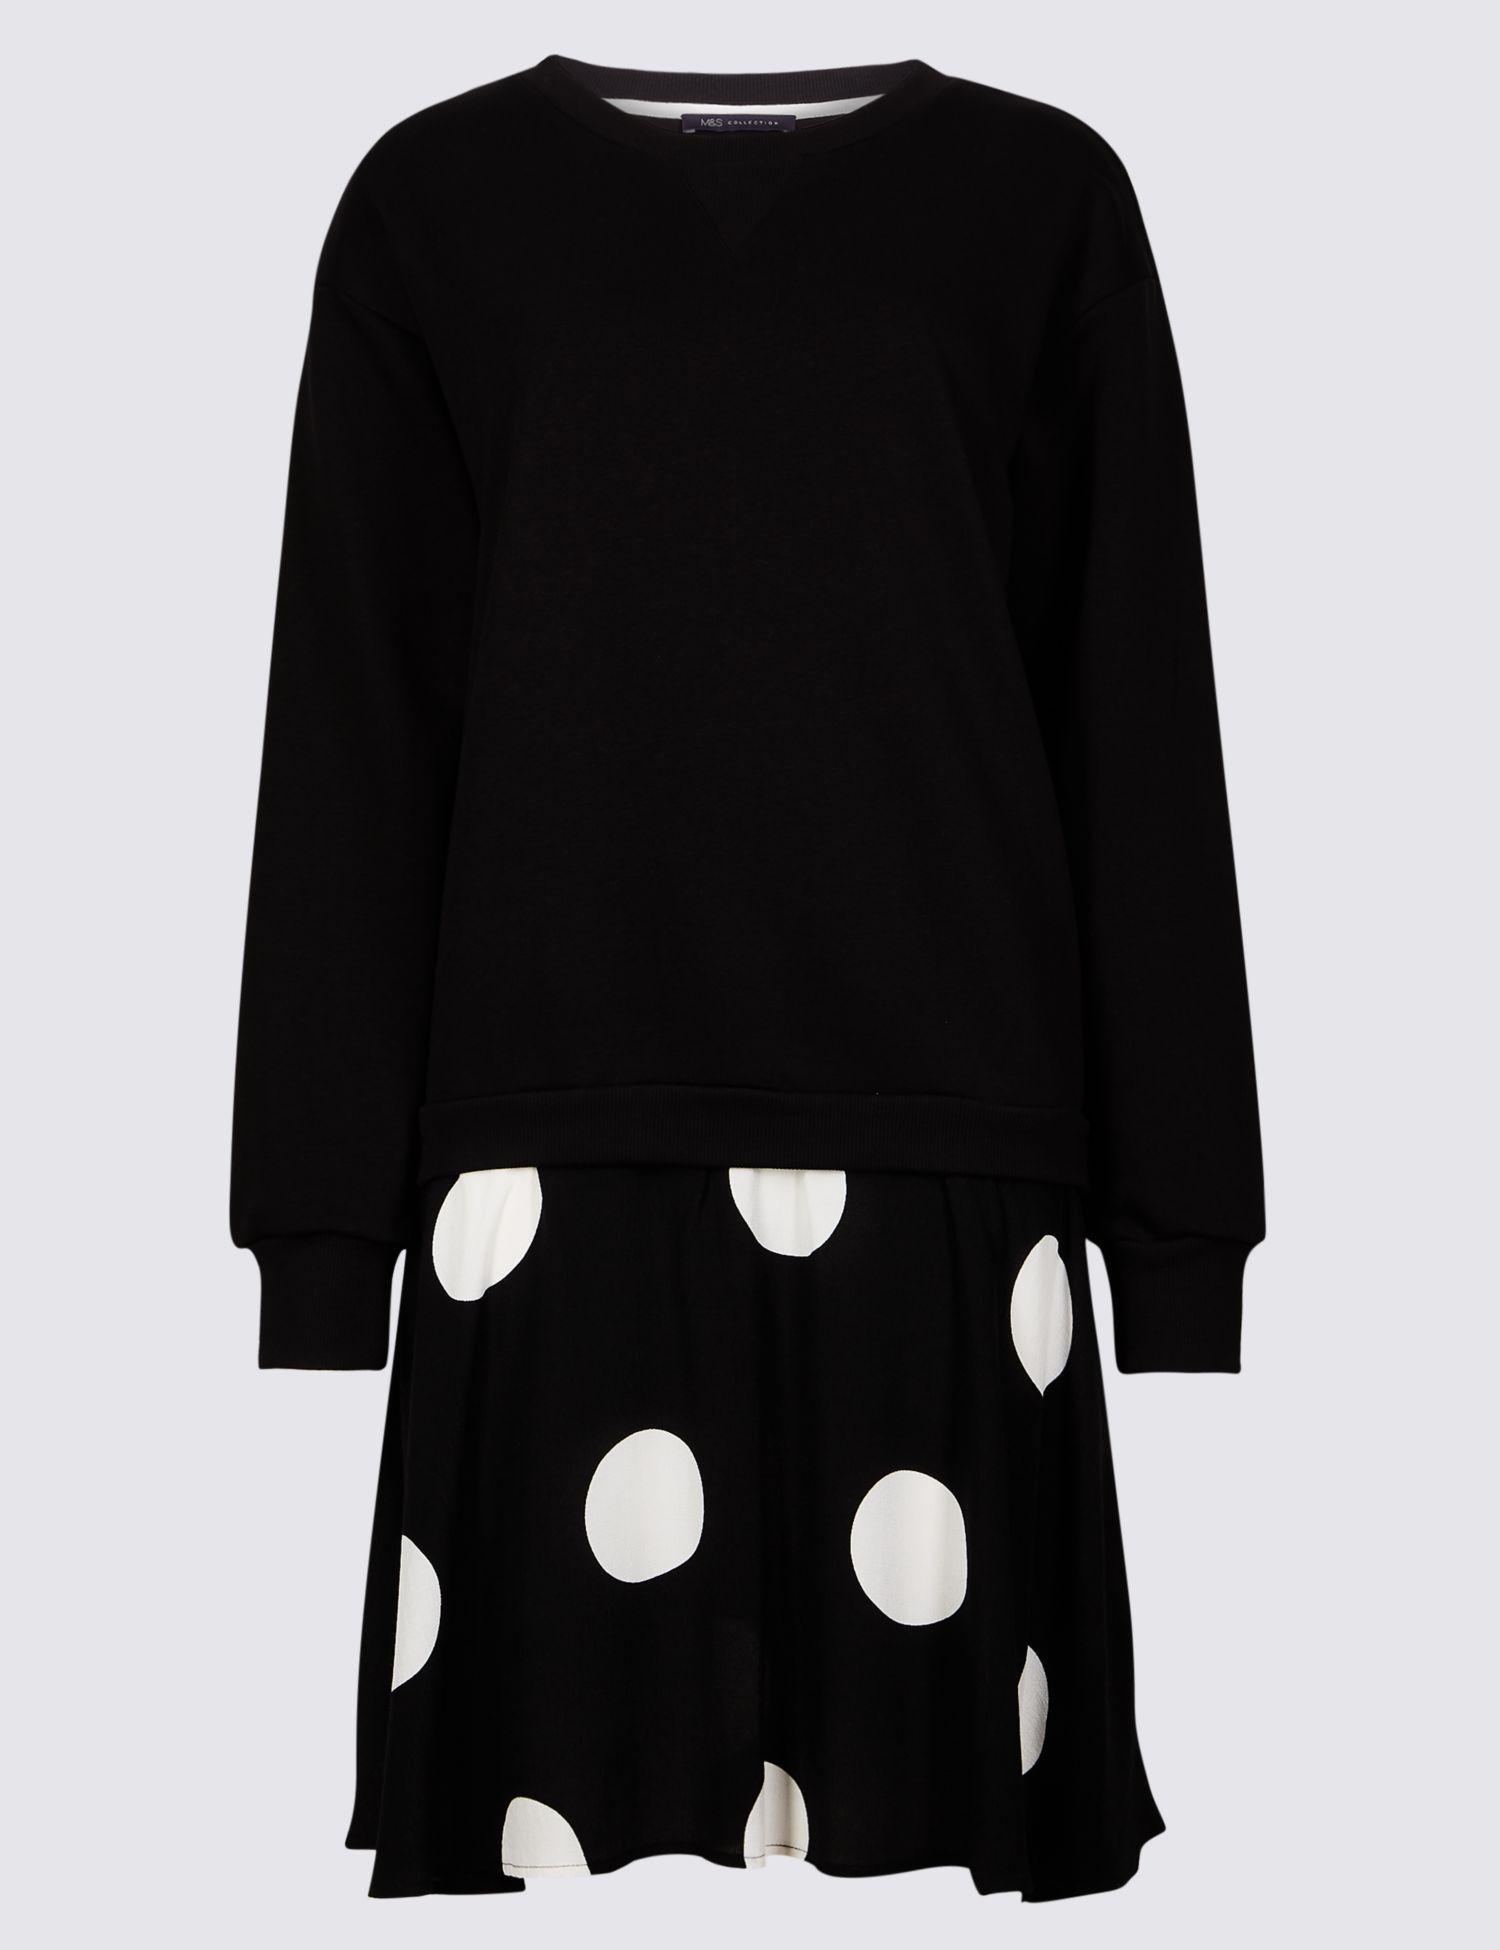 b54f46b8c5 Marks & Spencer Cotton Rich Printed Drop Waist Dress in Black - Lyst